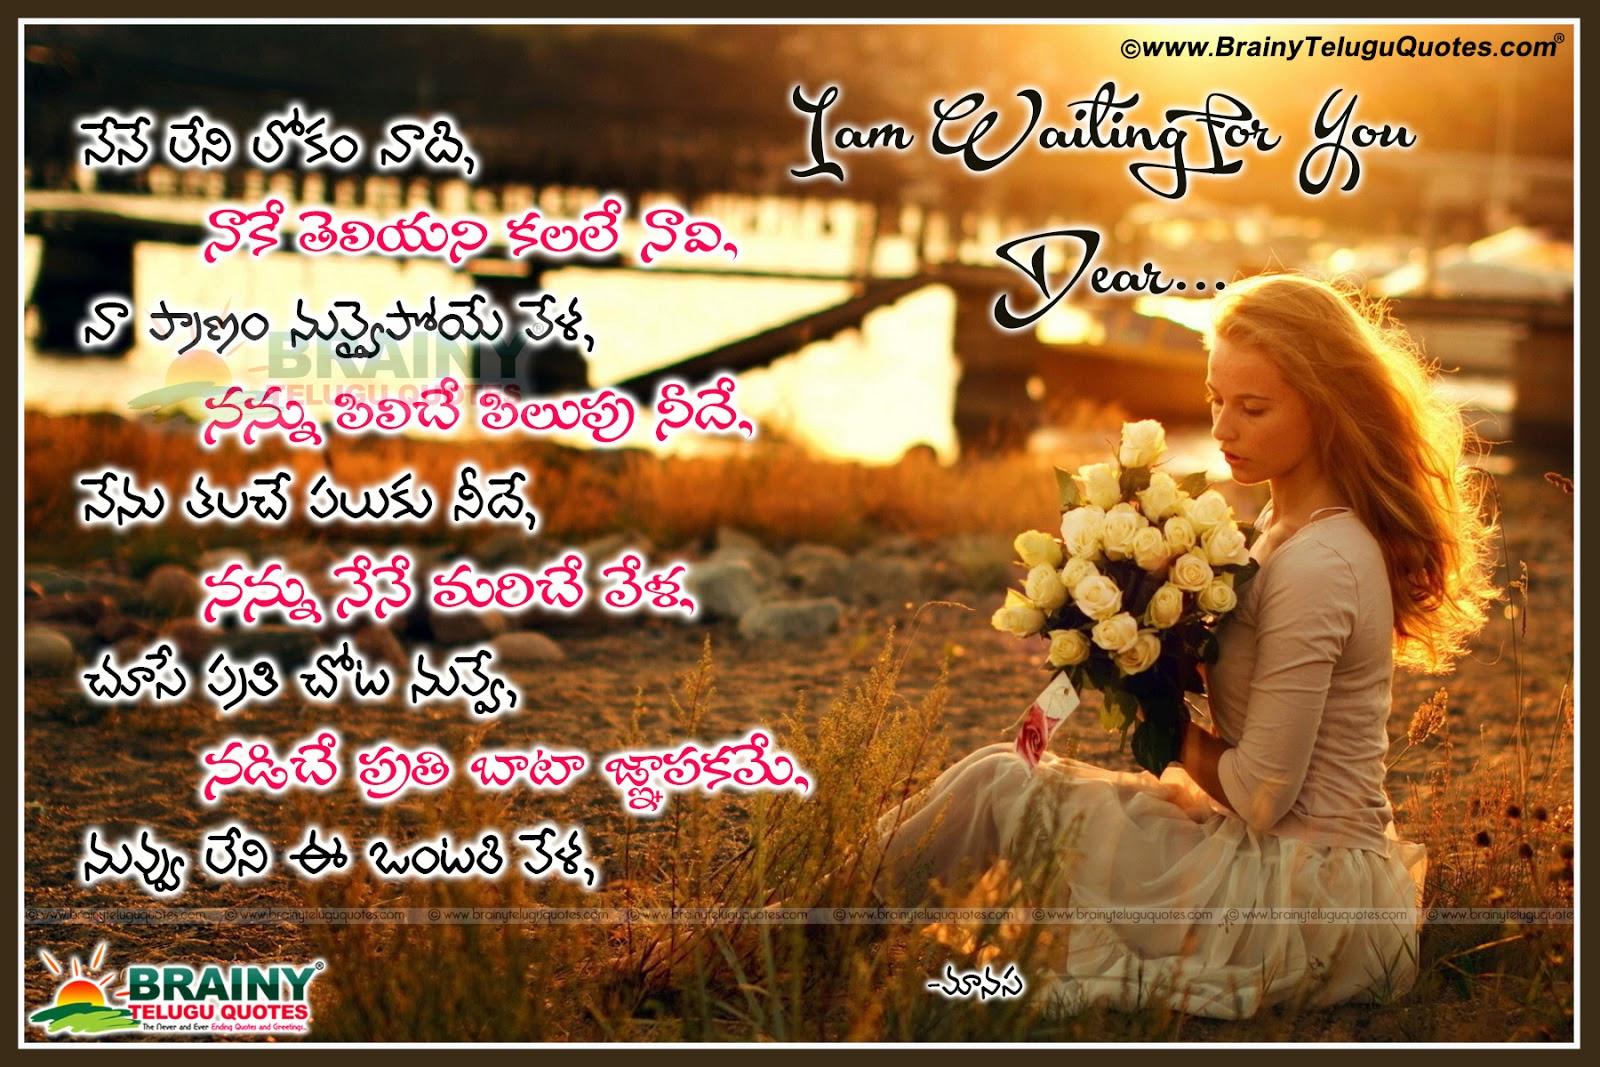 Heart touching sad love quotes wallpapers 9473651 joyfulvoicesfo m4hsunfo